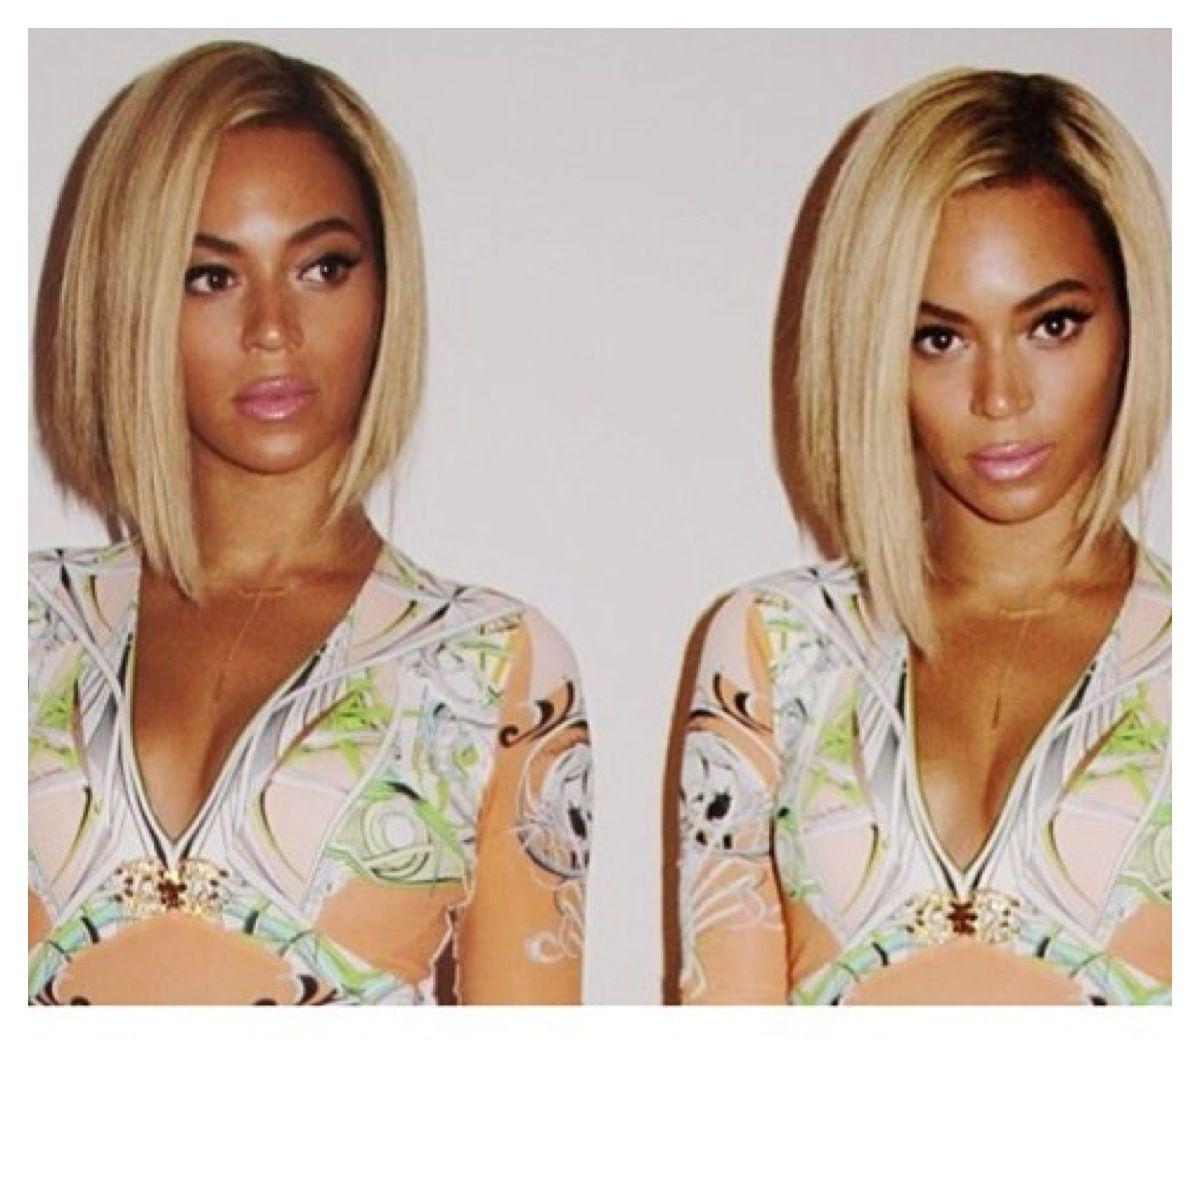 Beyonce's new hair. So cute